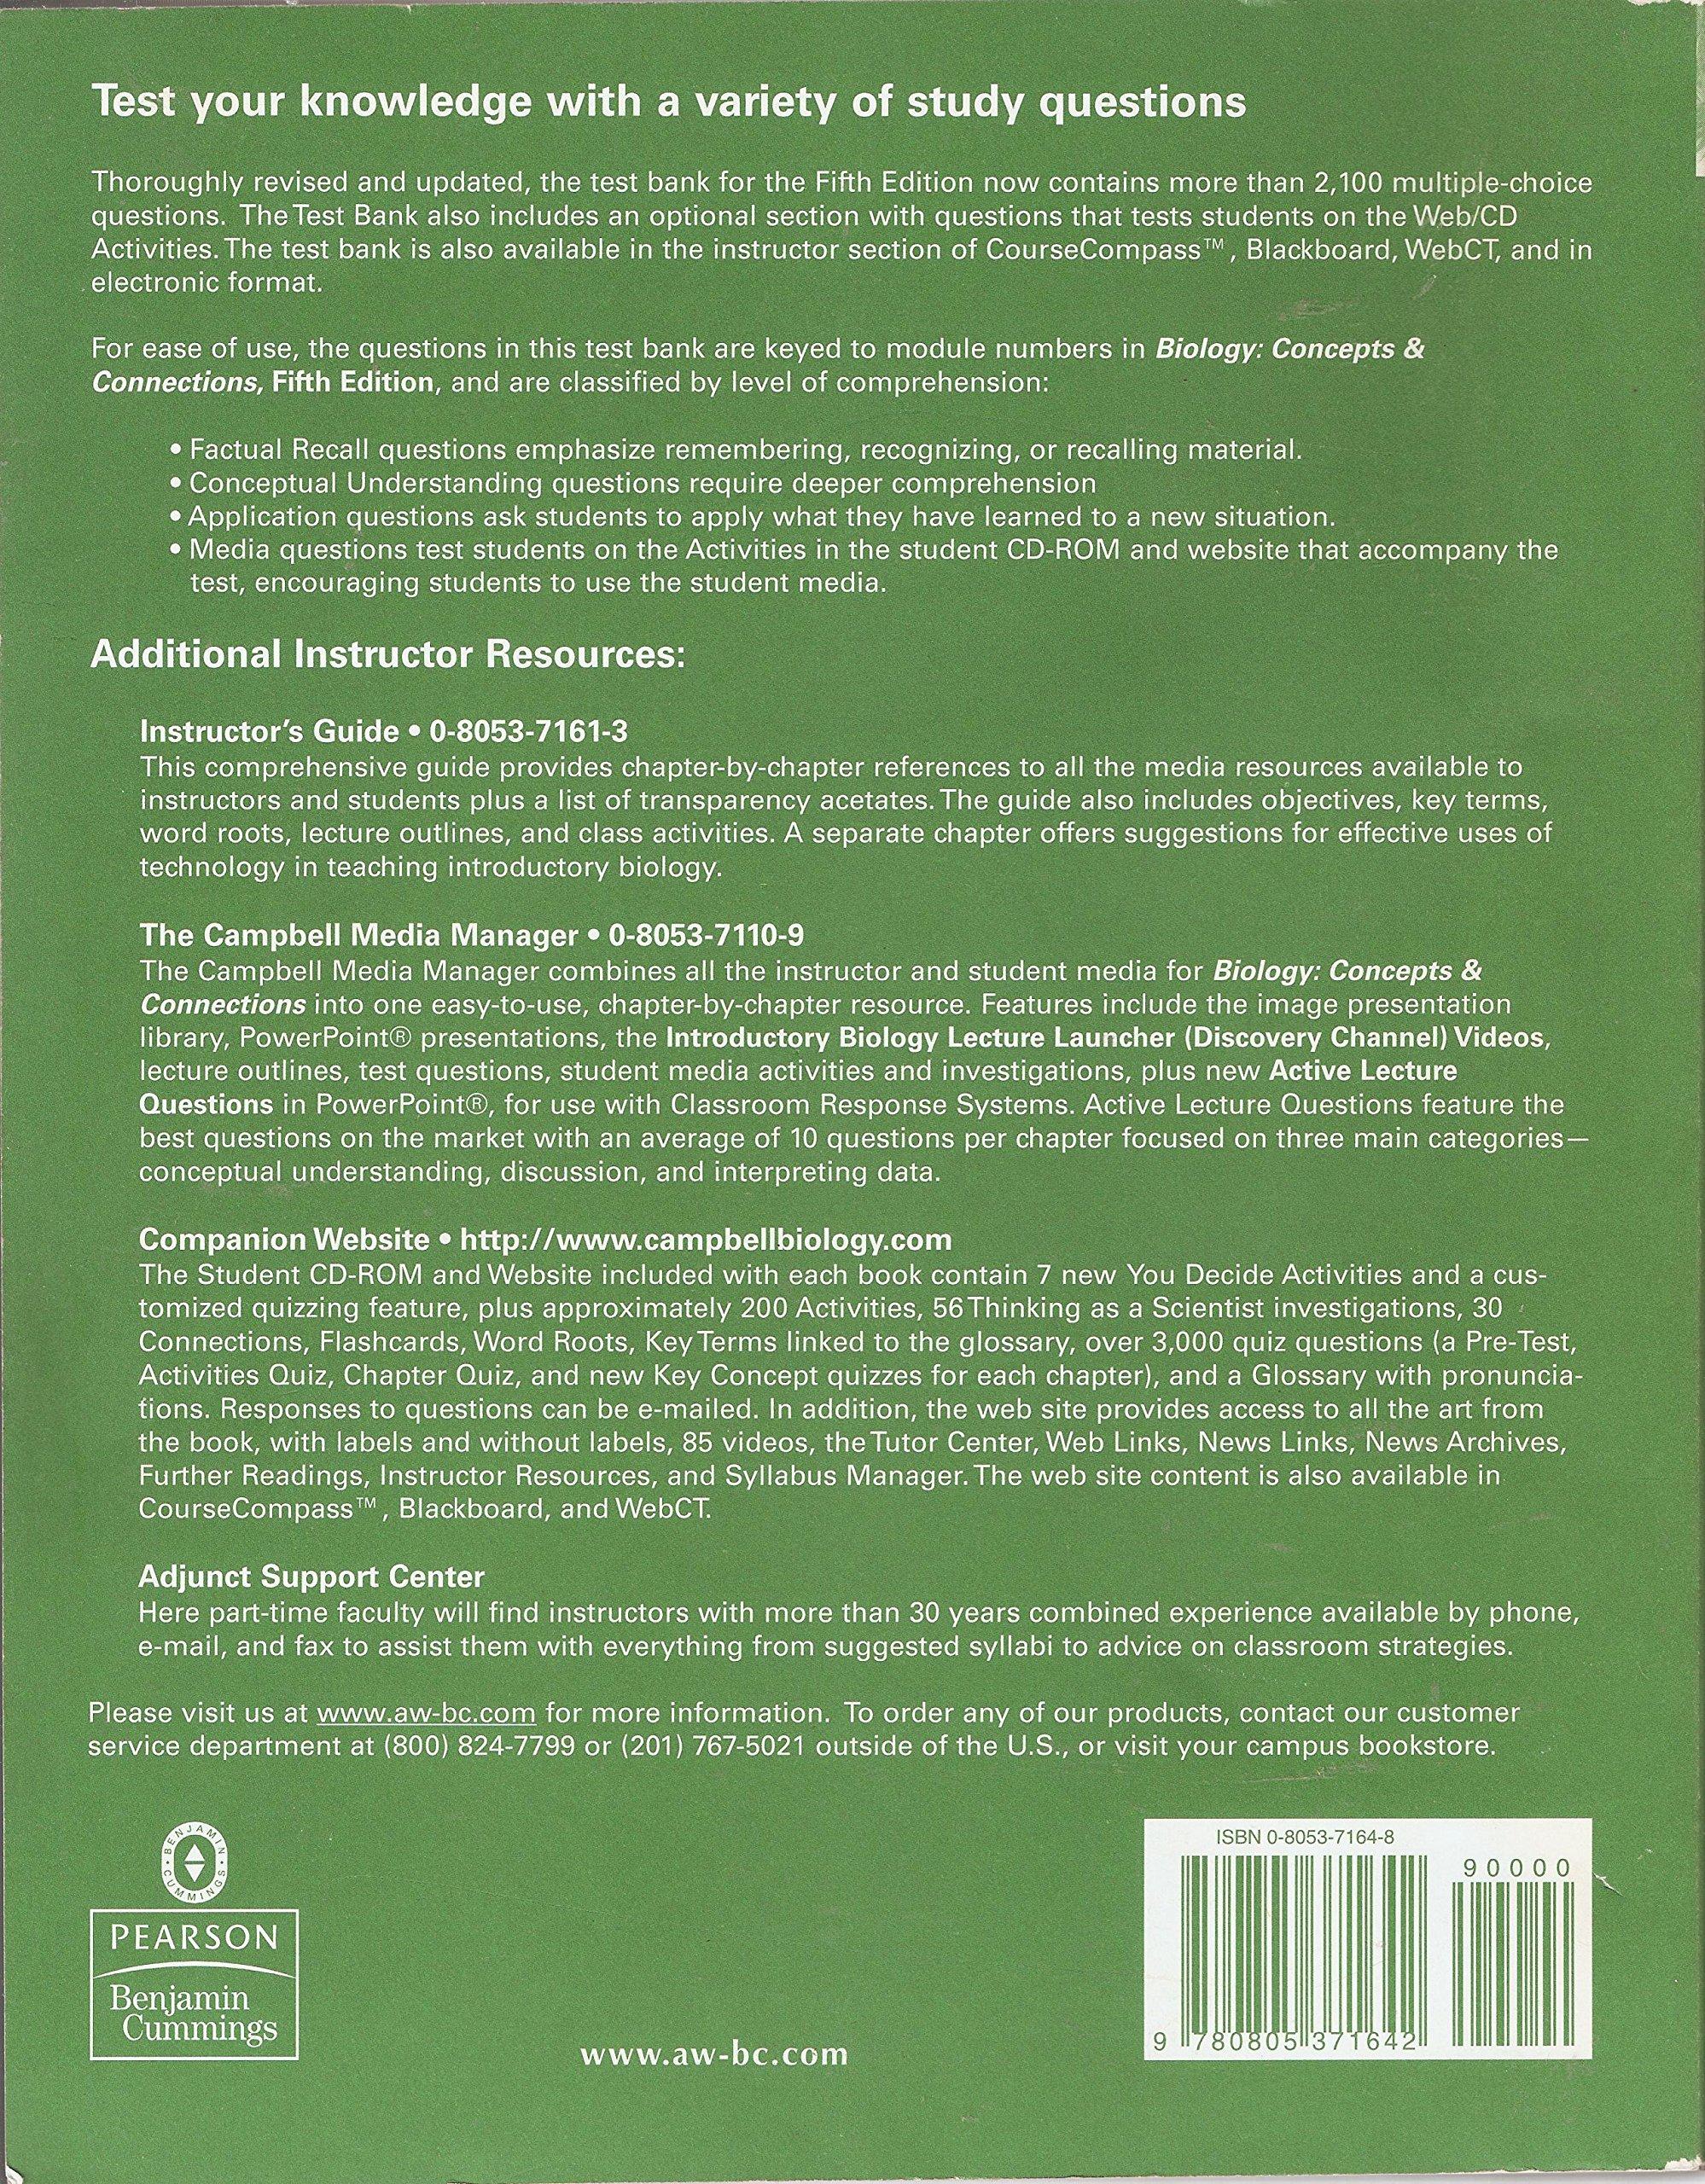 Biology Concepts & Connections (TEST BANK): EDWARD J. ZALISKO:  9780805371642: Amazon.com: Books